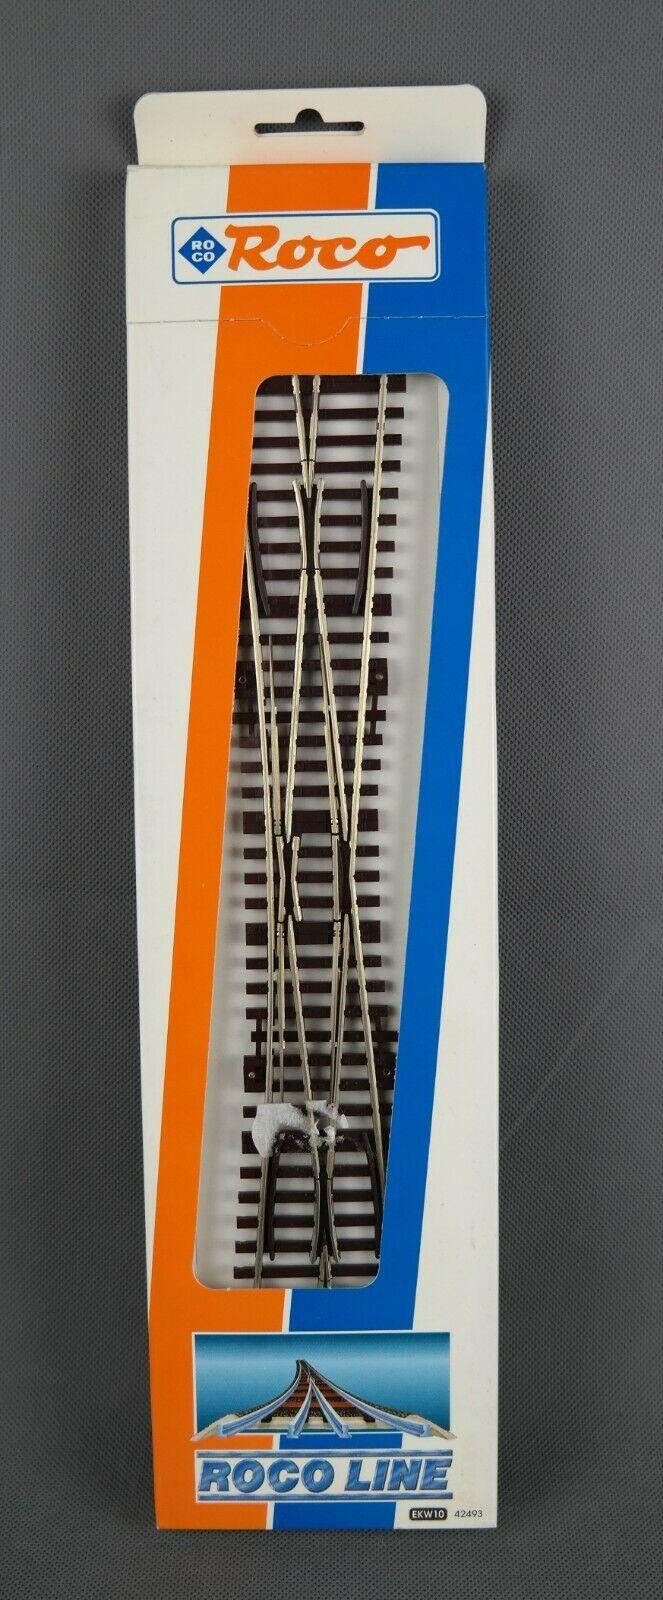 ROCO 42493  - Einfache Kreuzungsweiche Kreuzungsweiche Kreuzungsweiche EKW10  2xD2  D8 - NEUWARE  | Niedriger Preis  6146cd